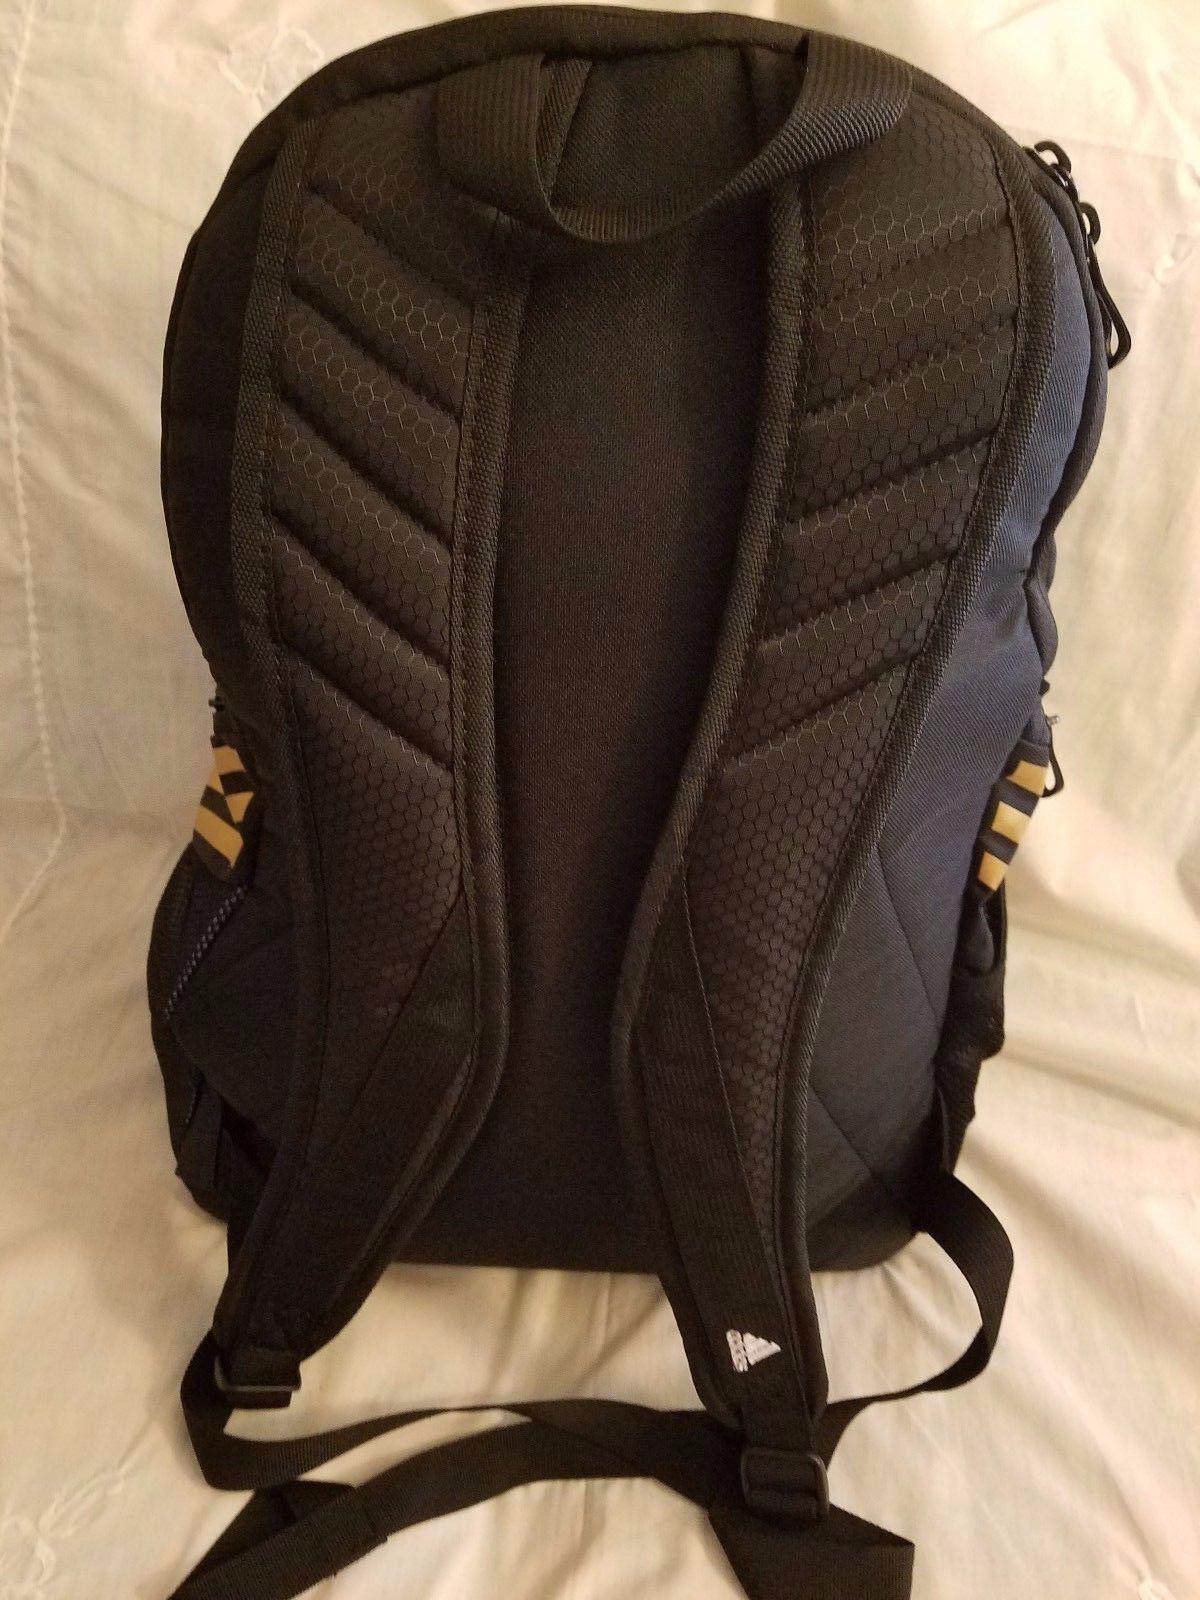 Adidas Estadio Iv Team Backpack Ball Carrier and 50 similar items 4d7e5c4625a83